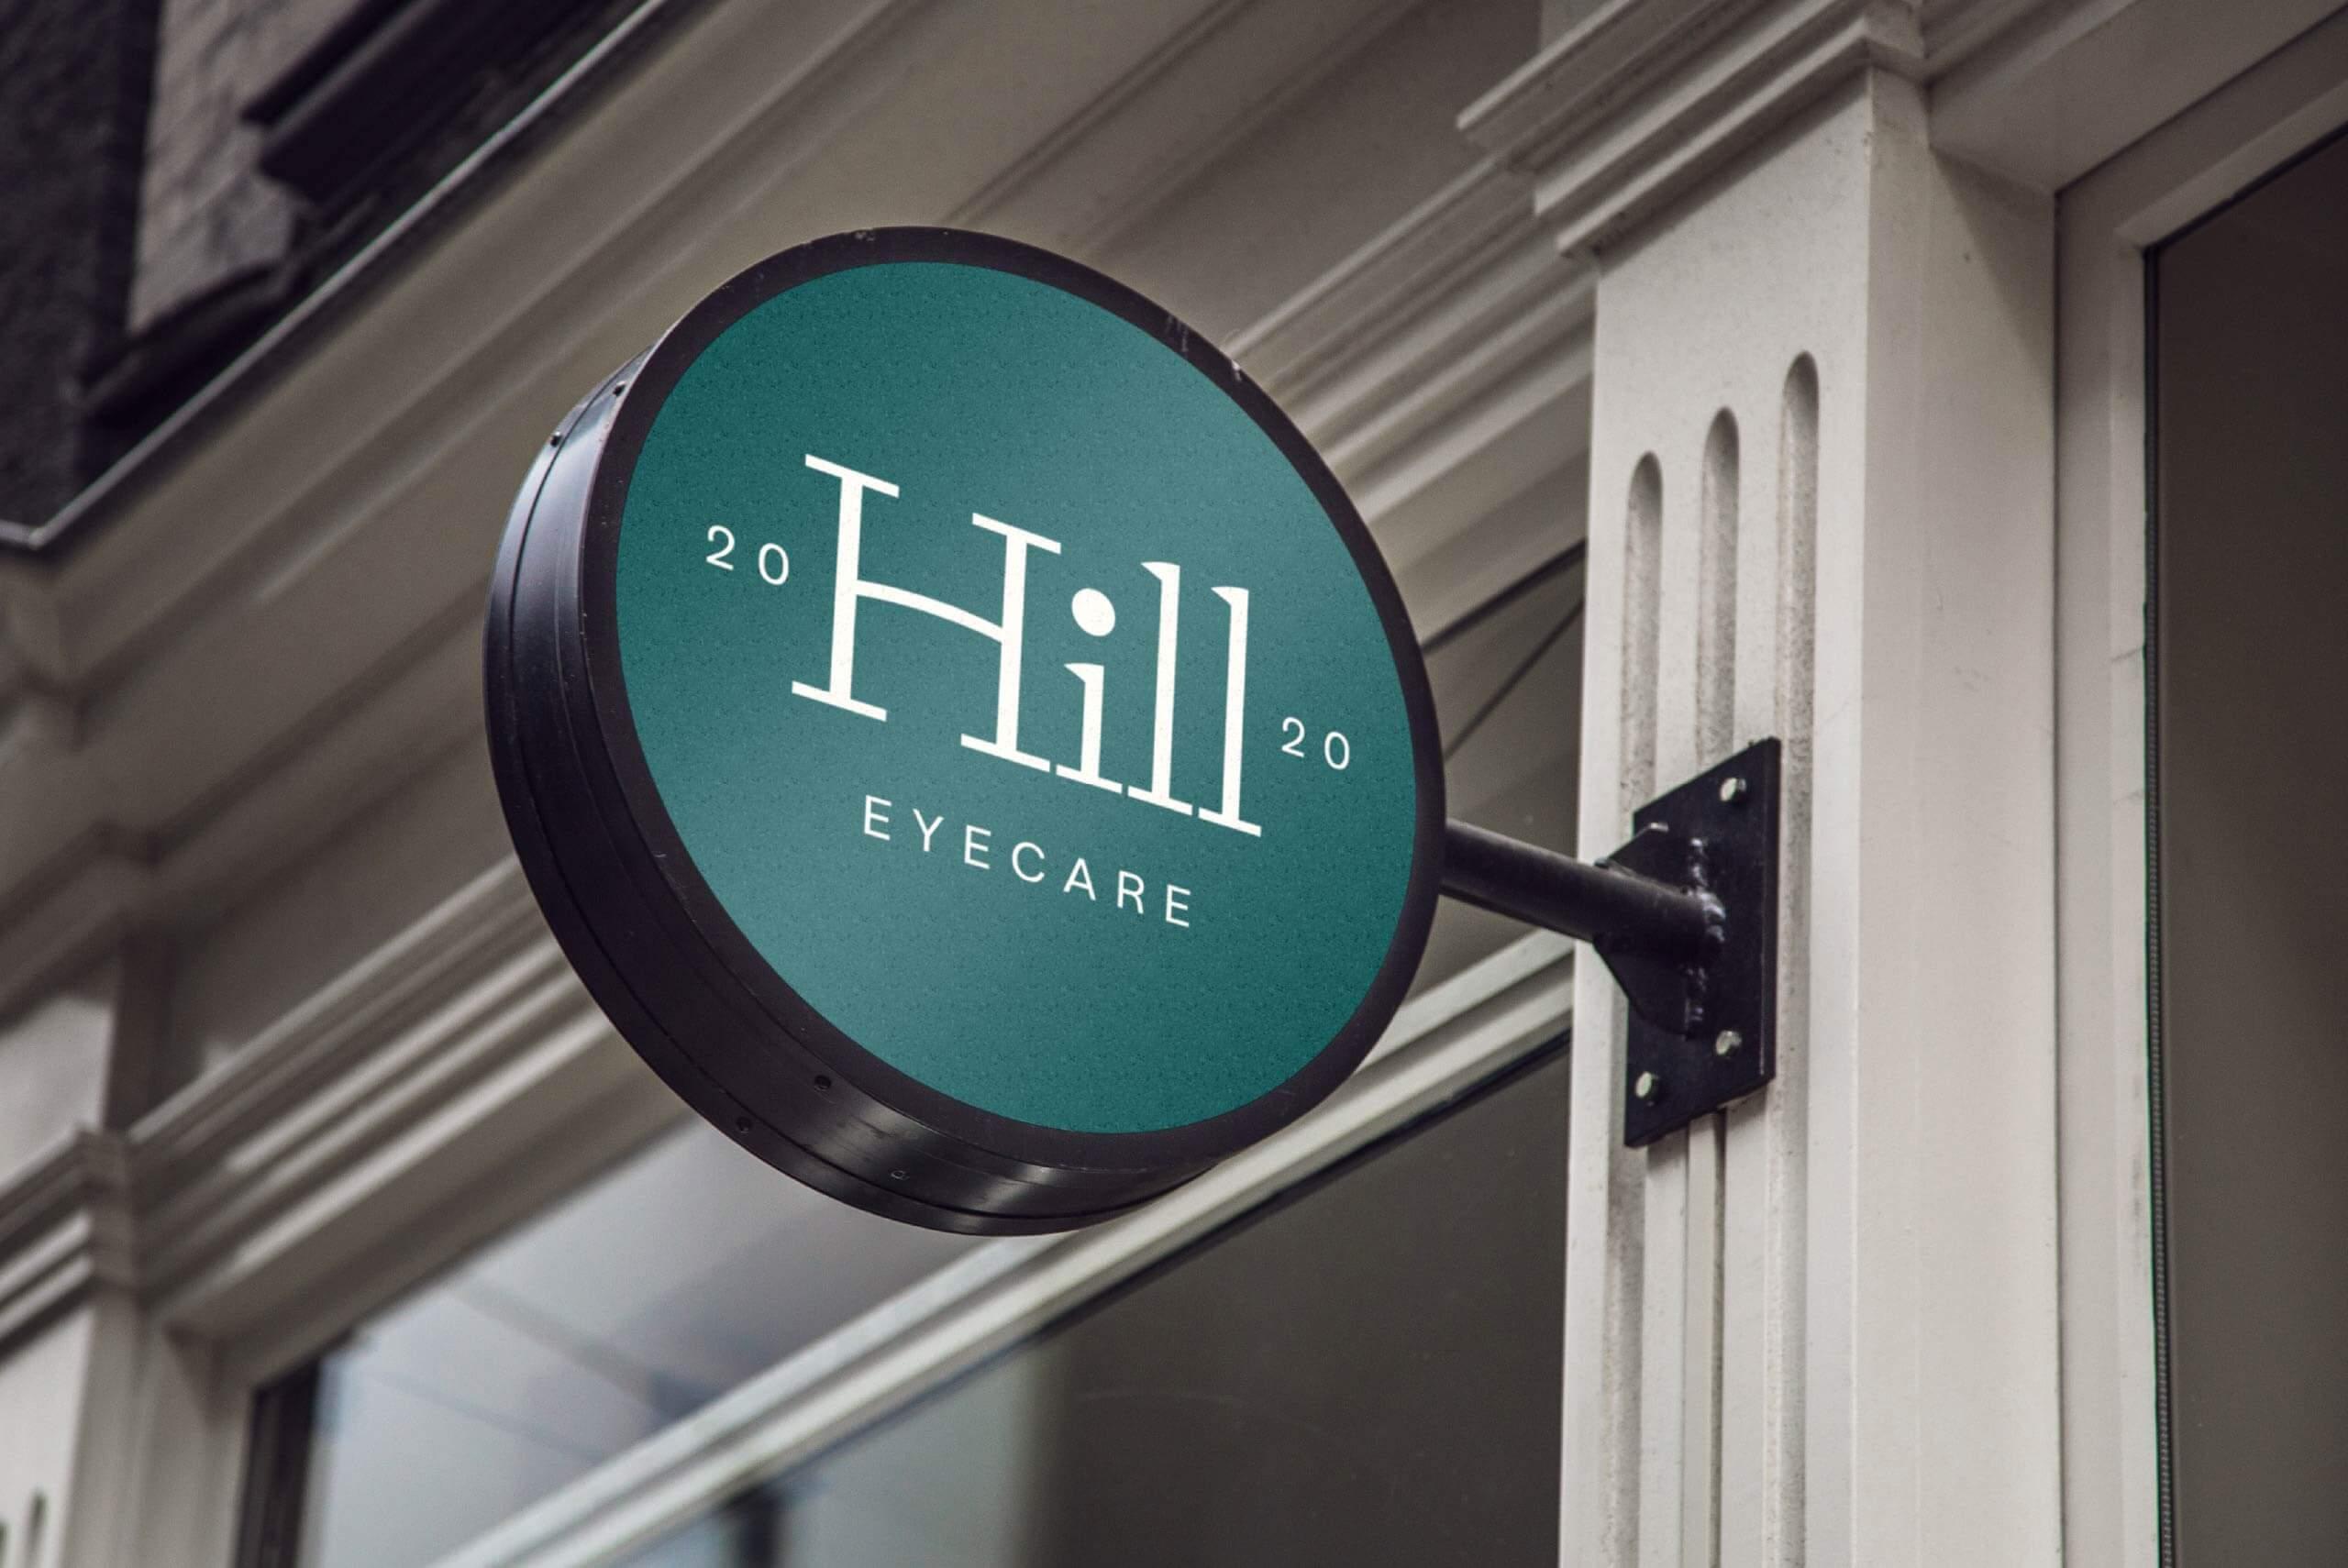 FRH-Hill-Eyecare1-copy-7